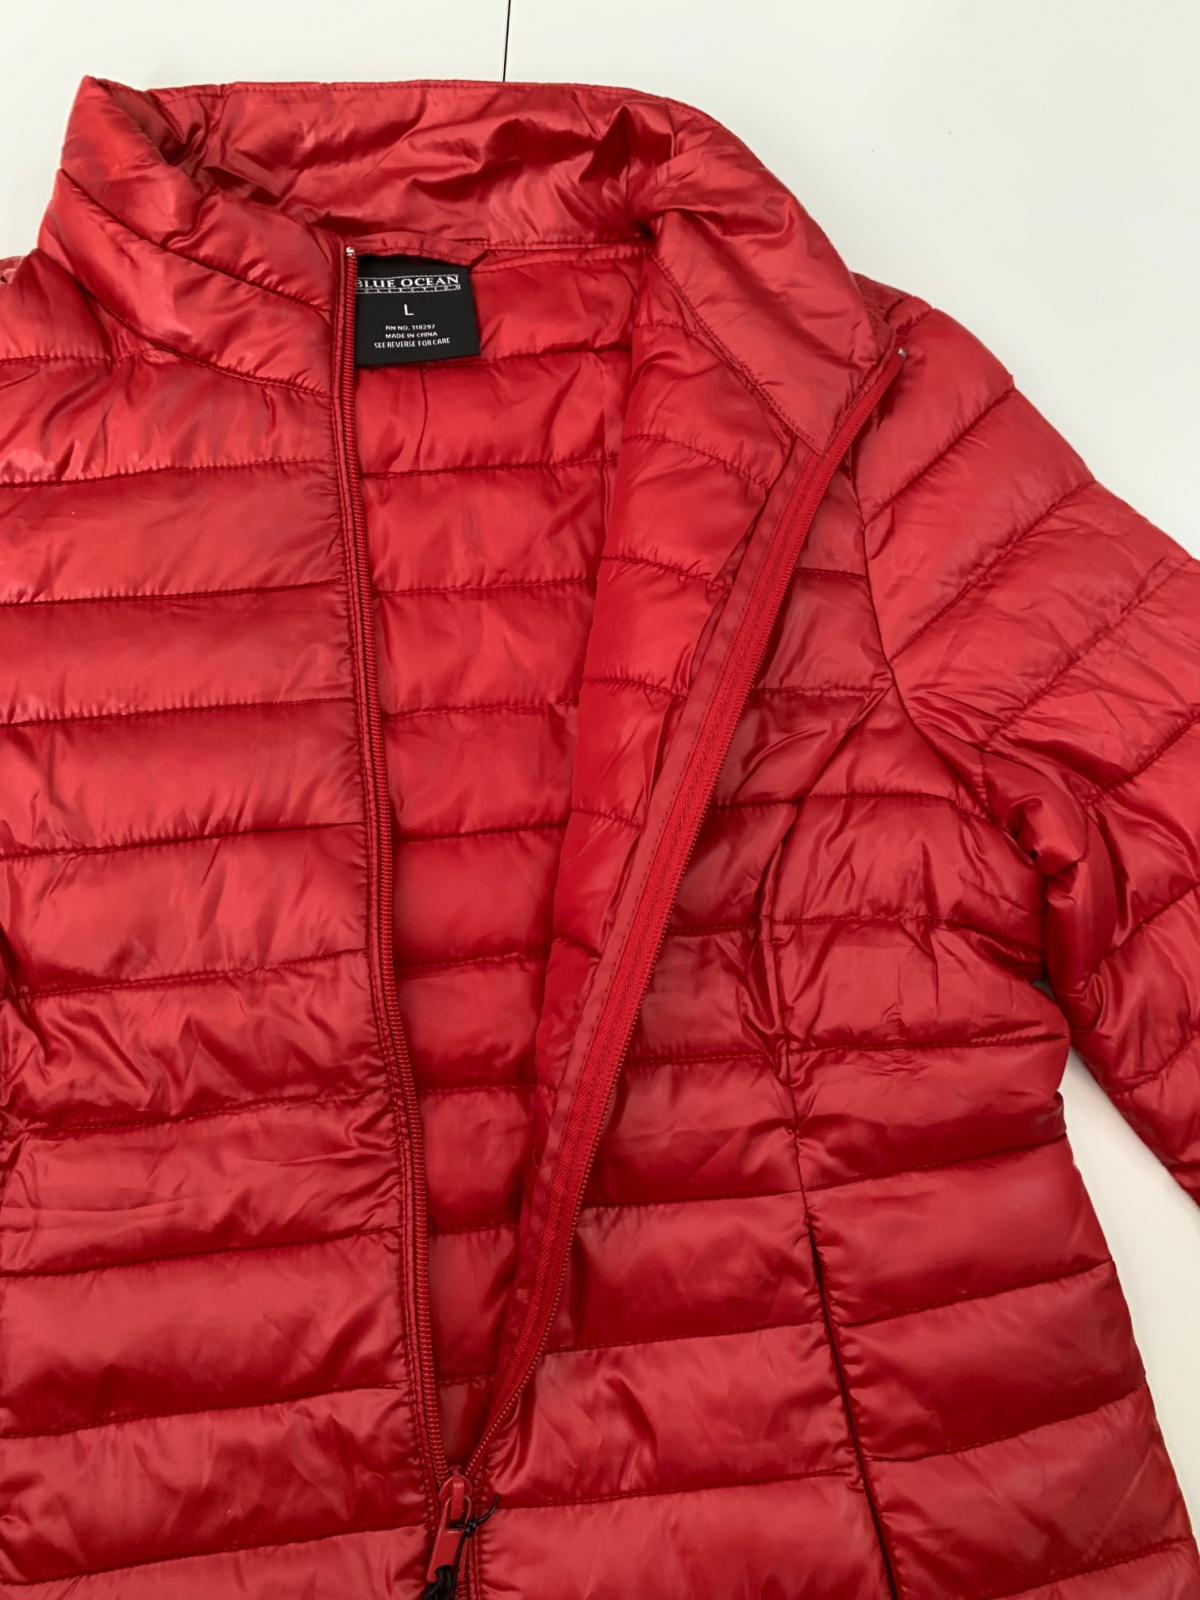 Красная женская куртка от бренда BLUE OCEAN